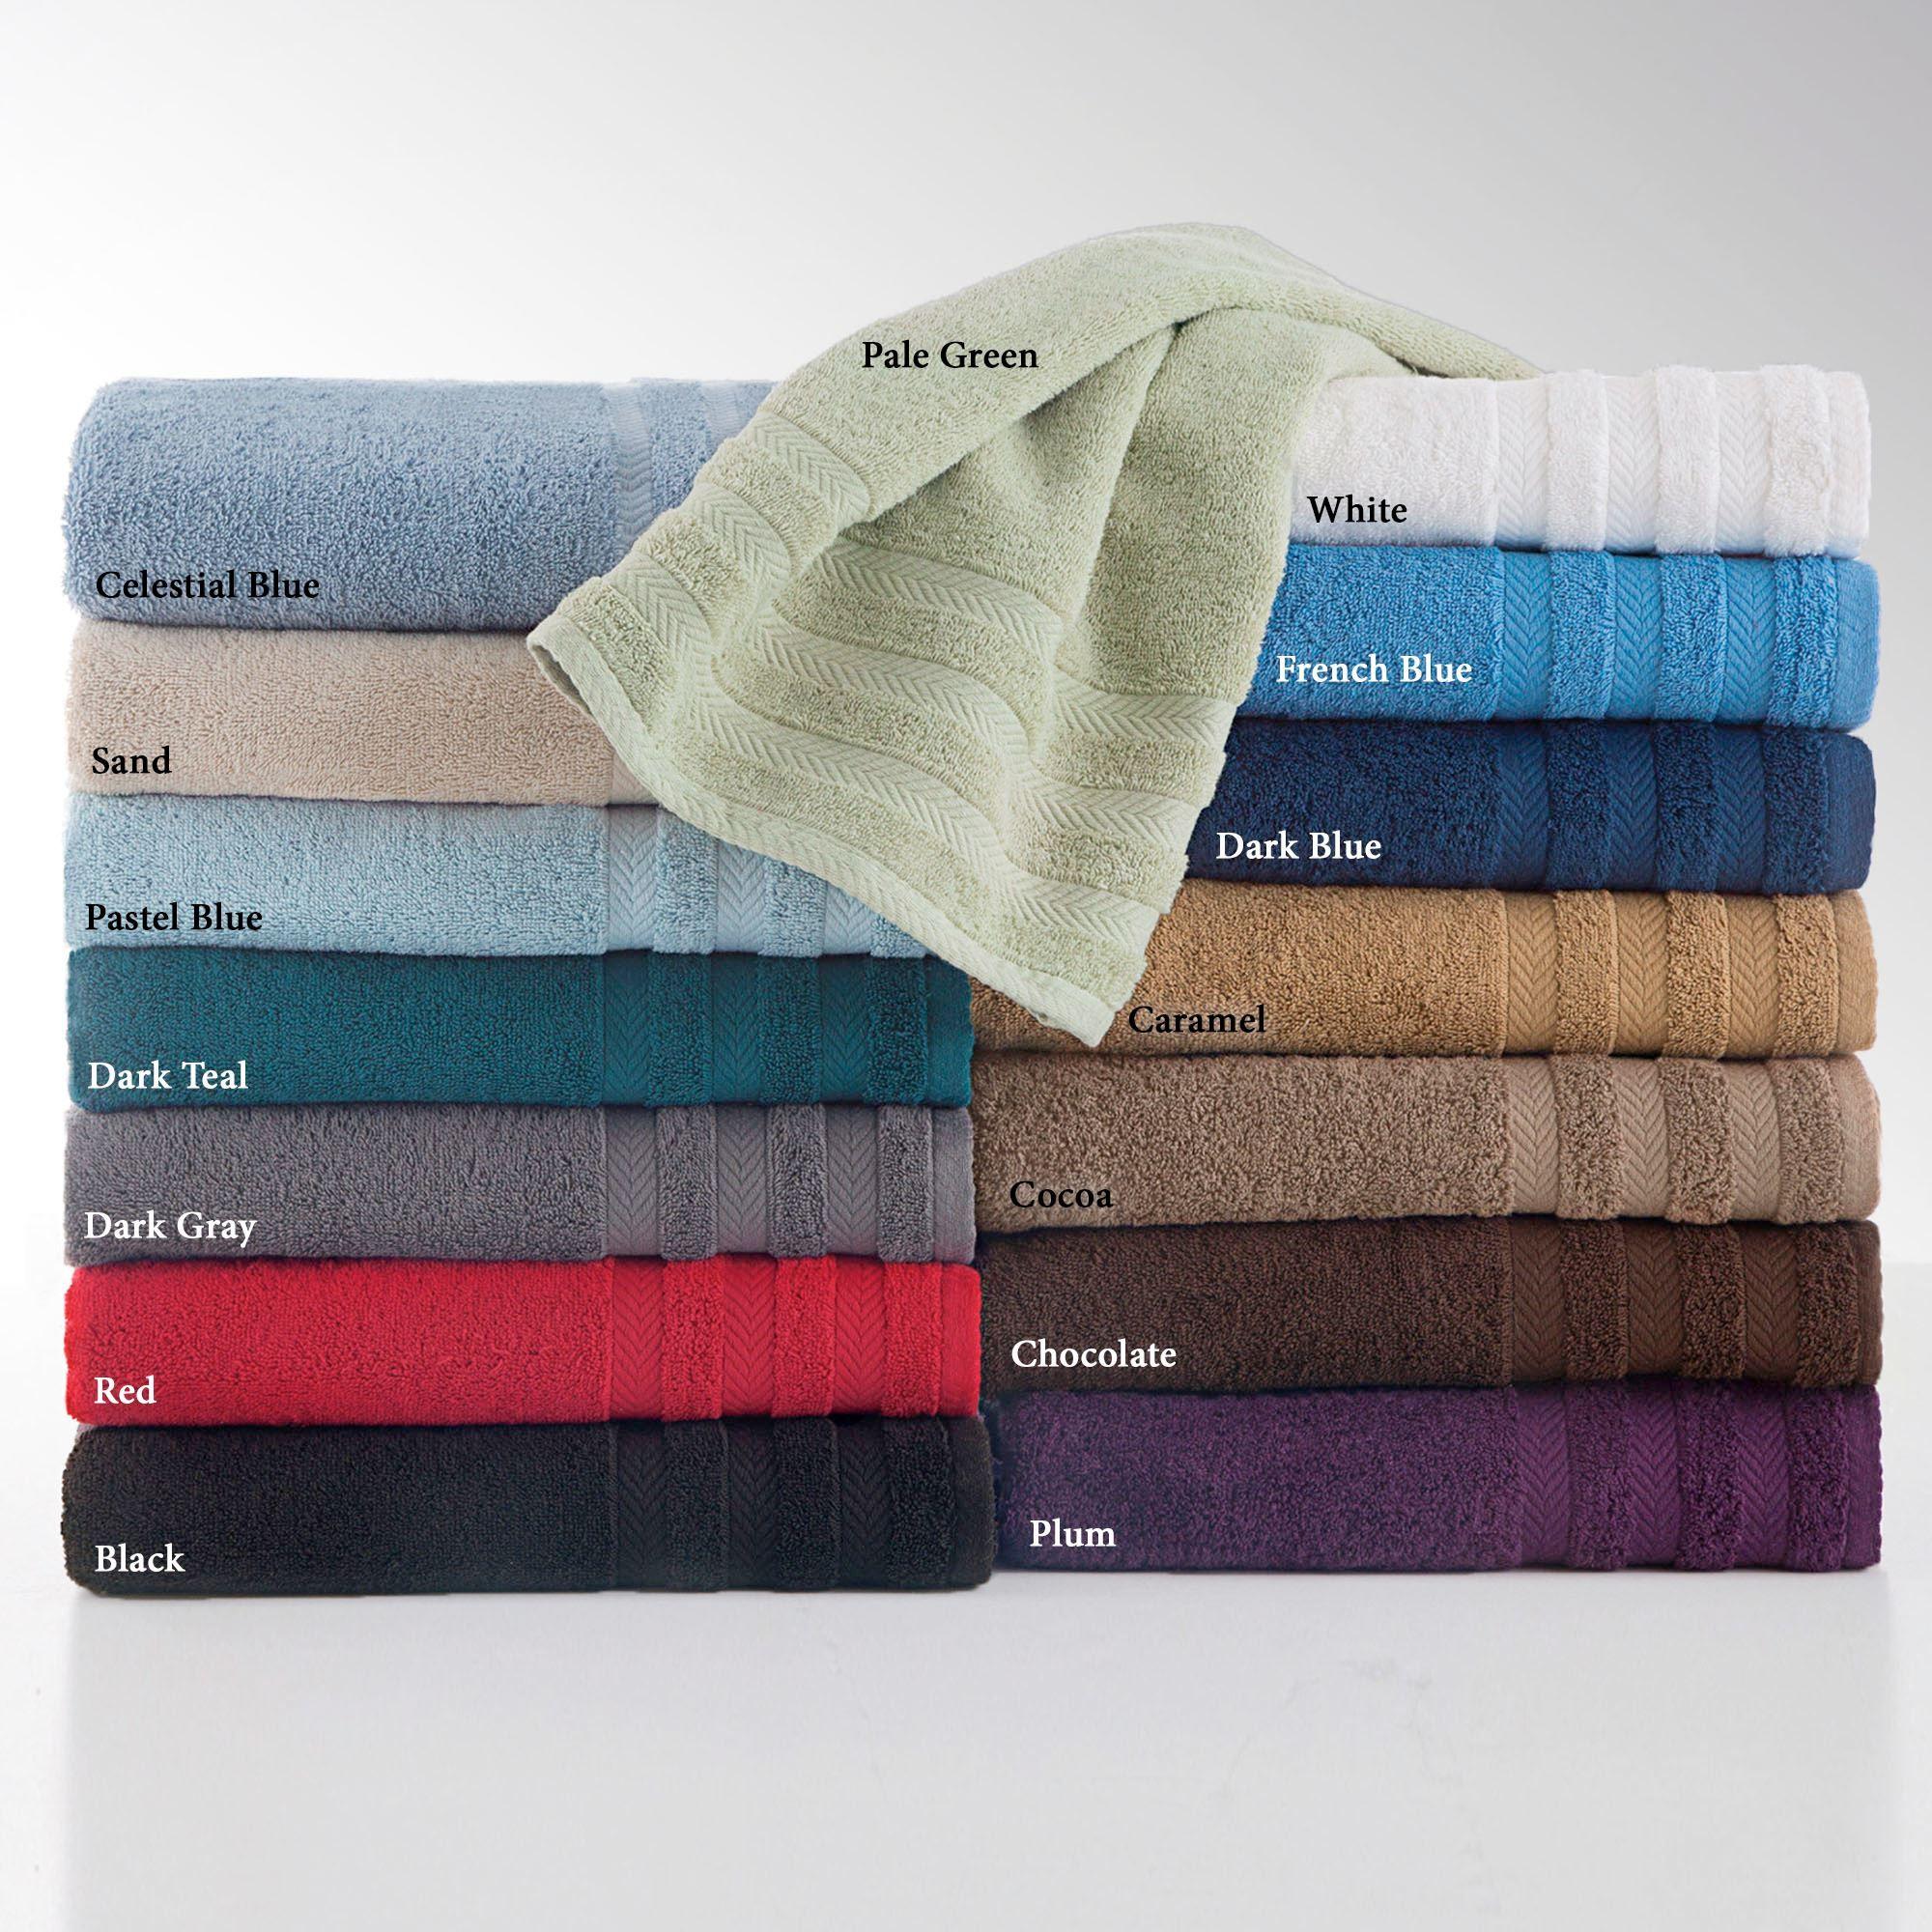 6 Piece Blended Egyptian Cotton Bath Towel Set